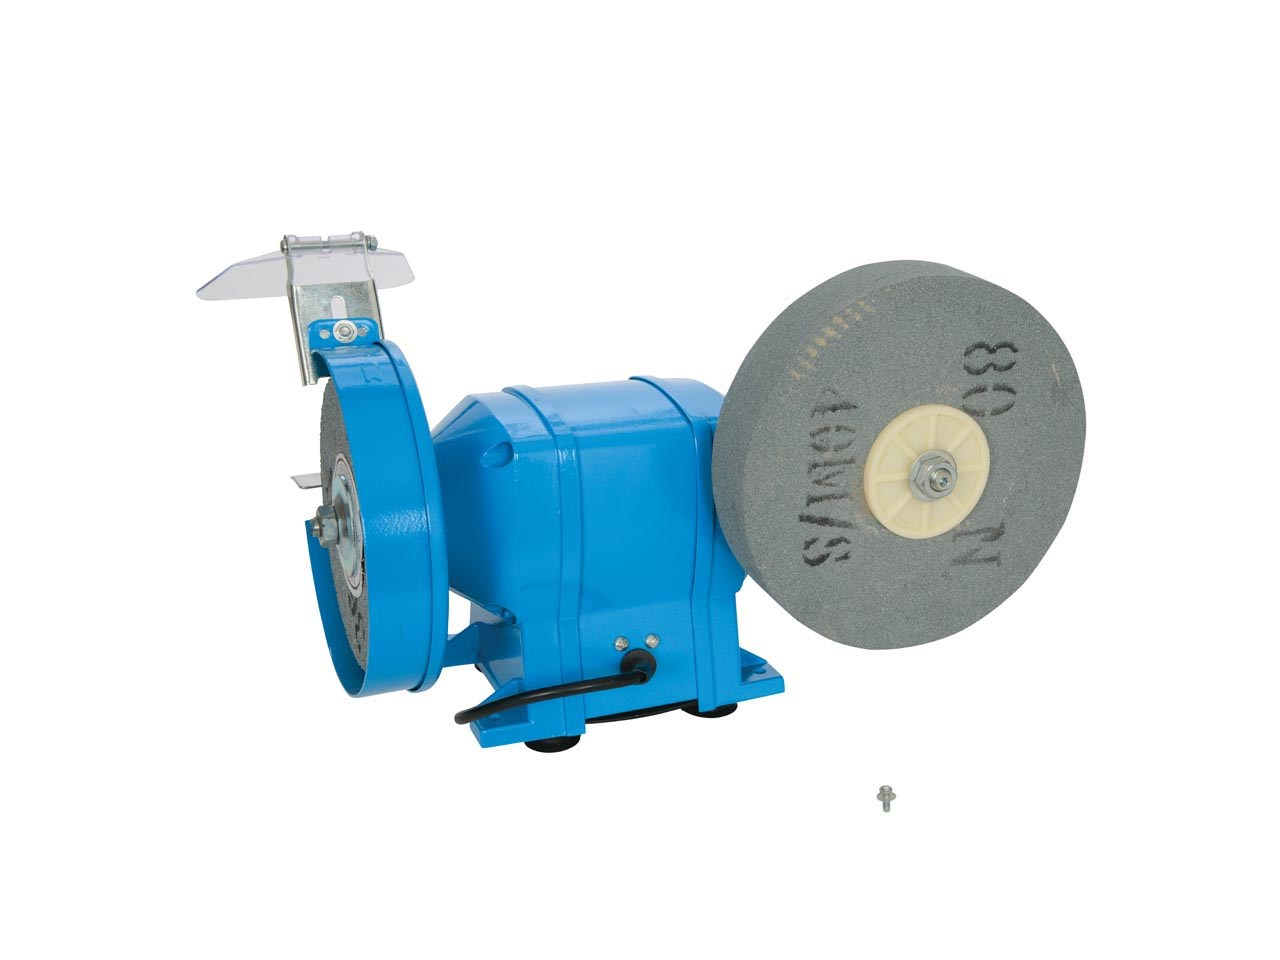 Silverline 544813 DIY 250W Wet And Dry Bench Grinder